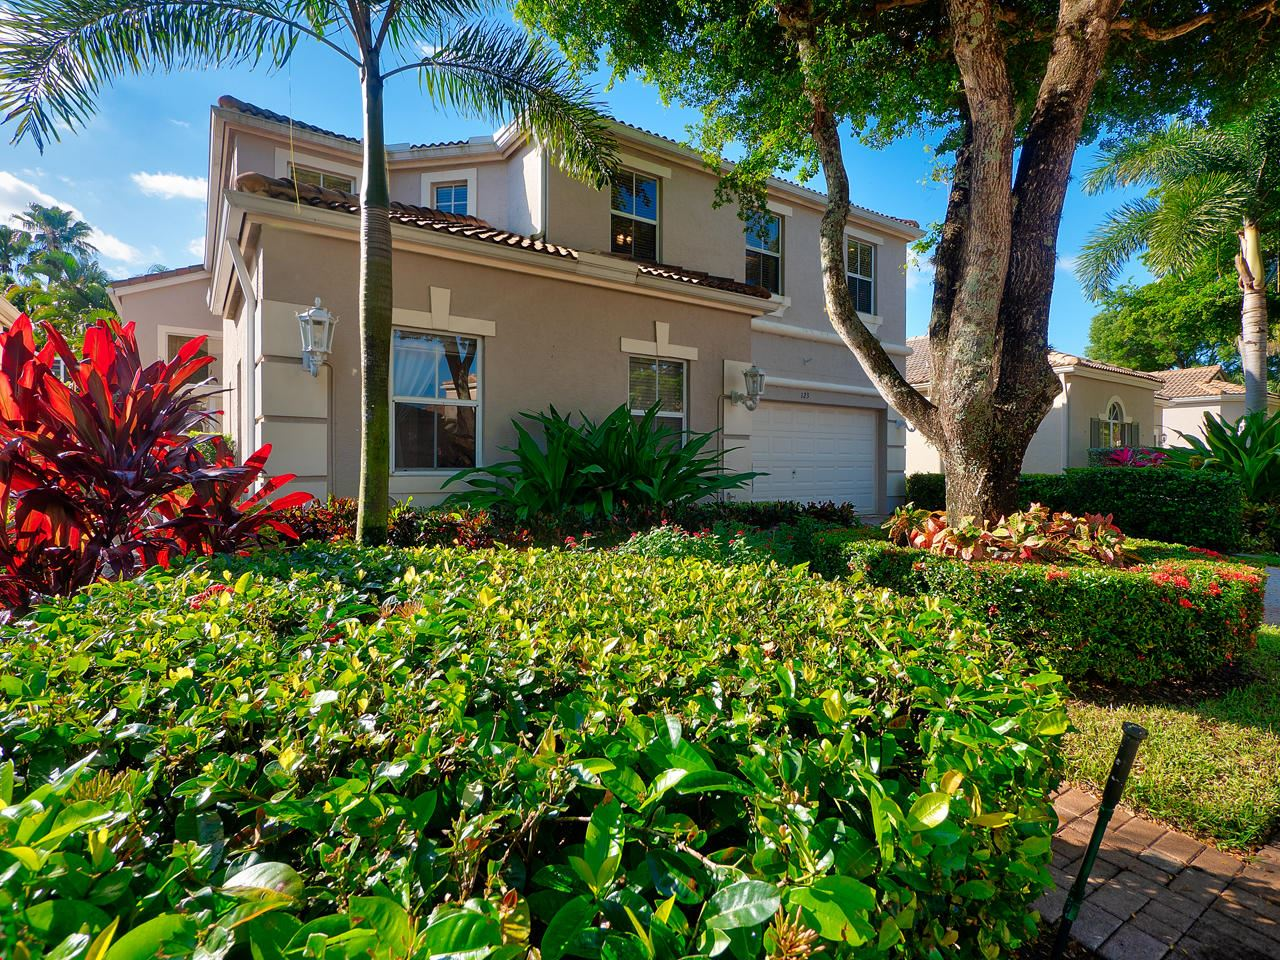 Photo of 123 Sunset Bay Drive, Palm Beach Gardens, FL 33418 (MLS # RX-10632300)